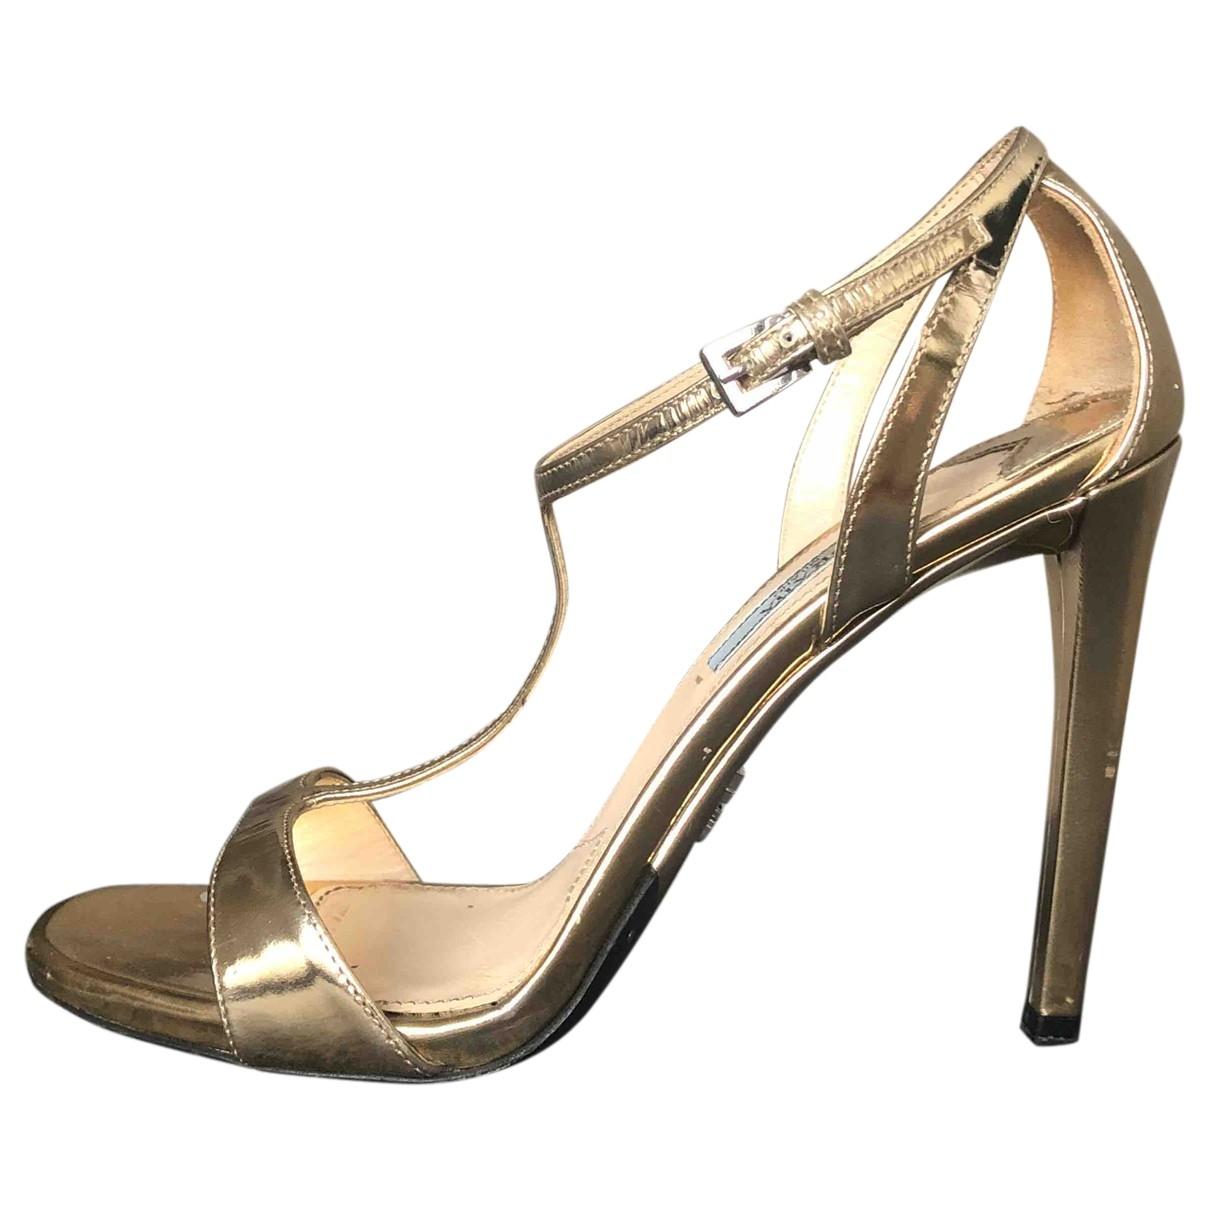 Prada \N Gold Patent leather Sandals for Women 38 EU